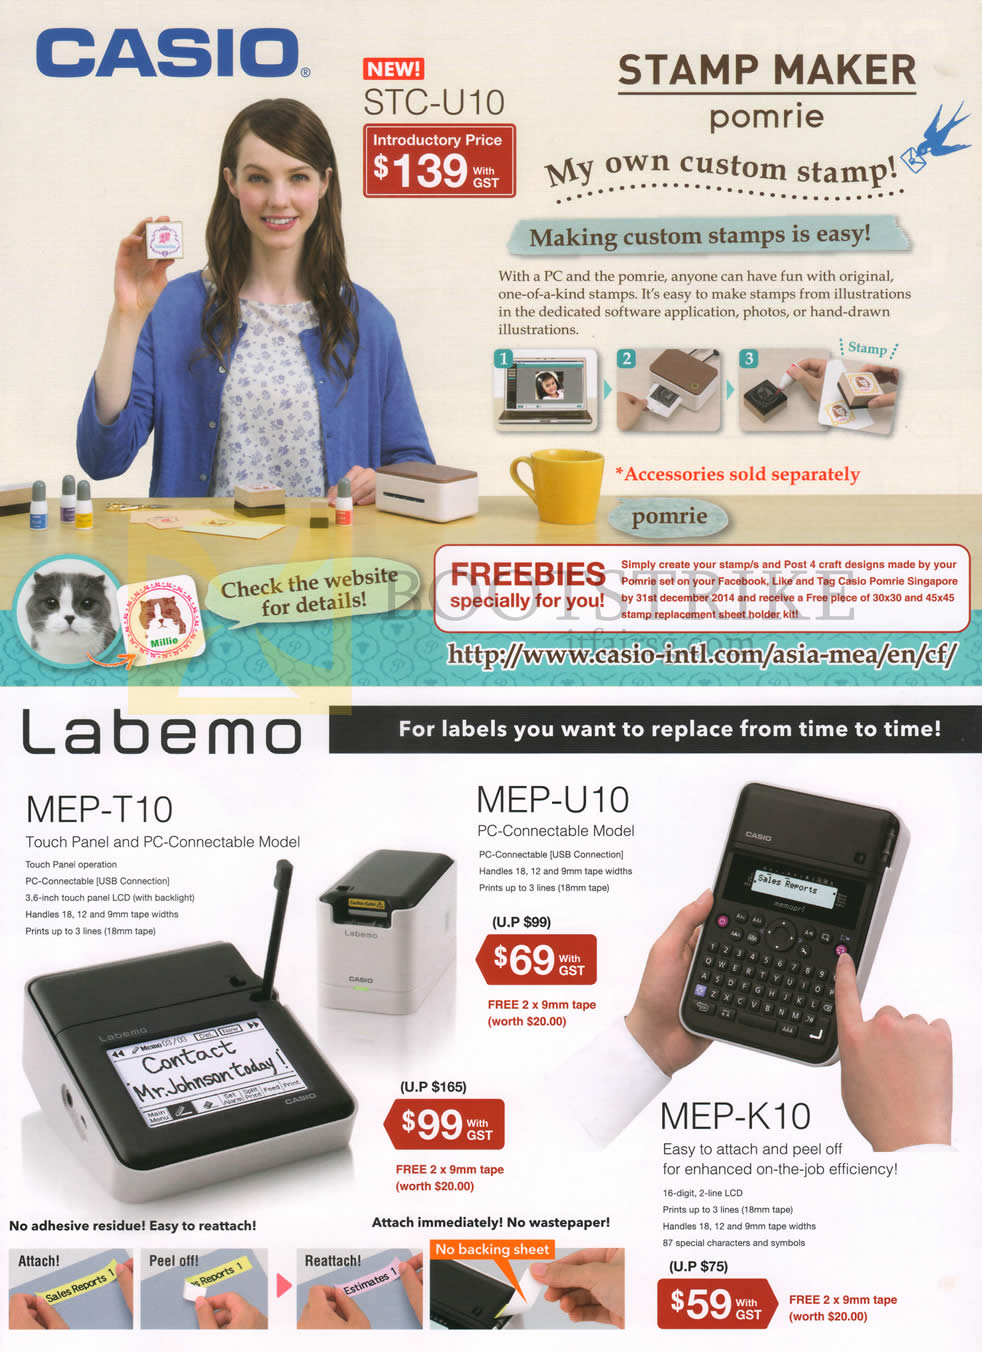 SITEX 2014 price list image brochure of Casio Stamp Maker, Labellers, STC-U10, Labemo MEP-T10, MEP-U10. MEP-K10